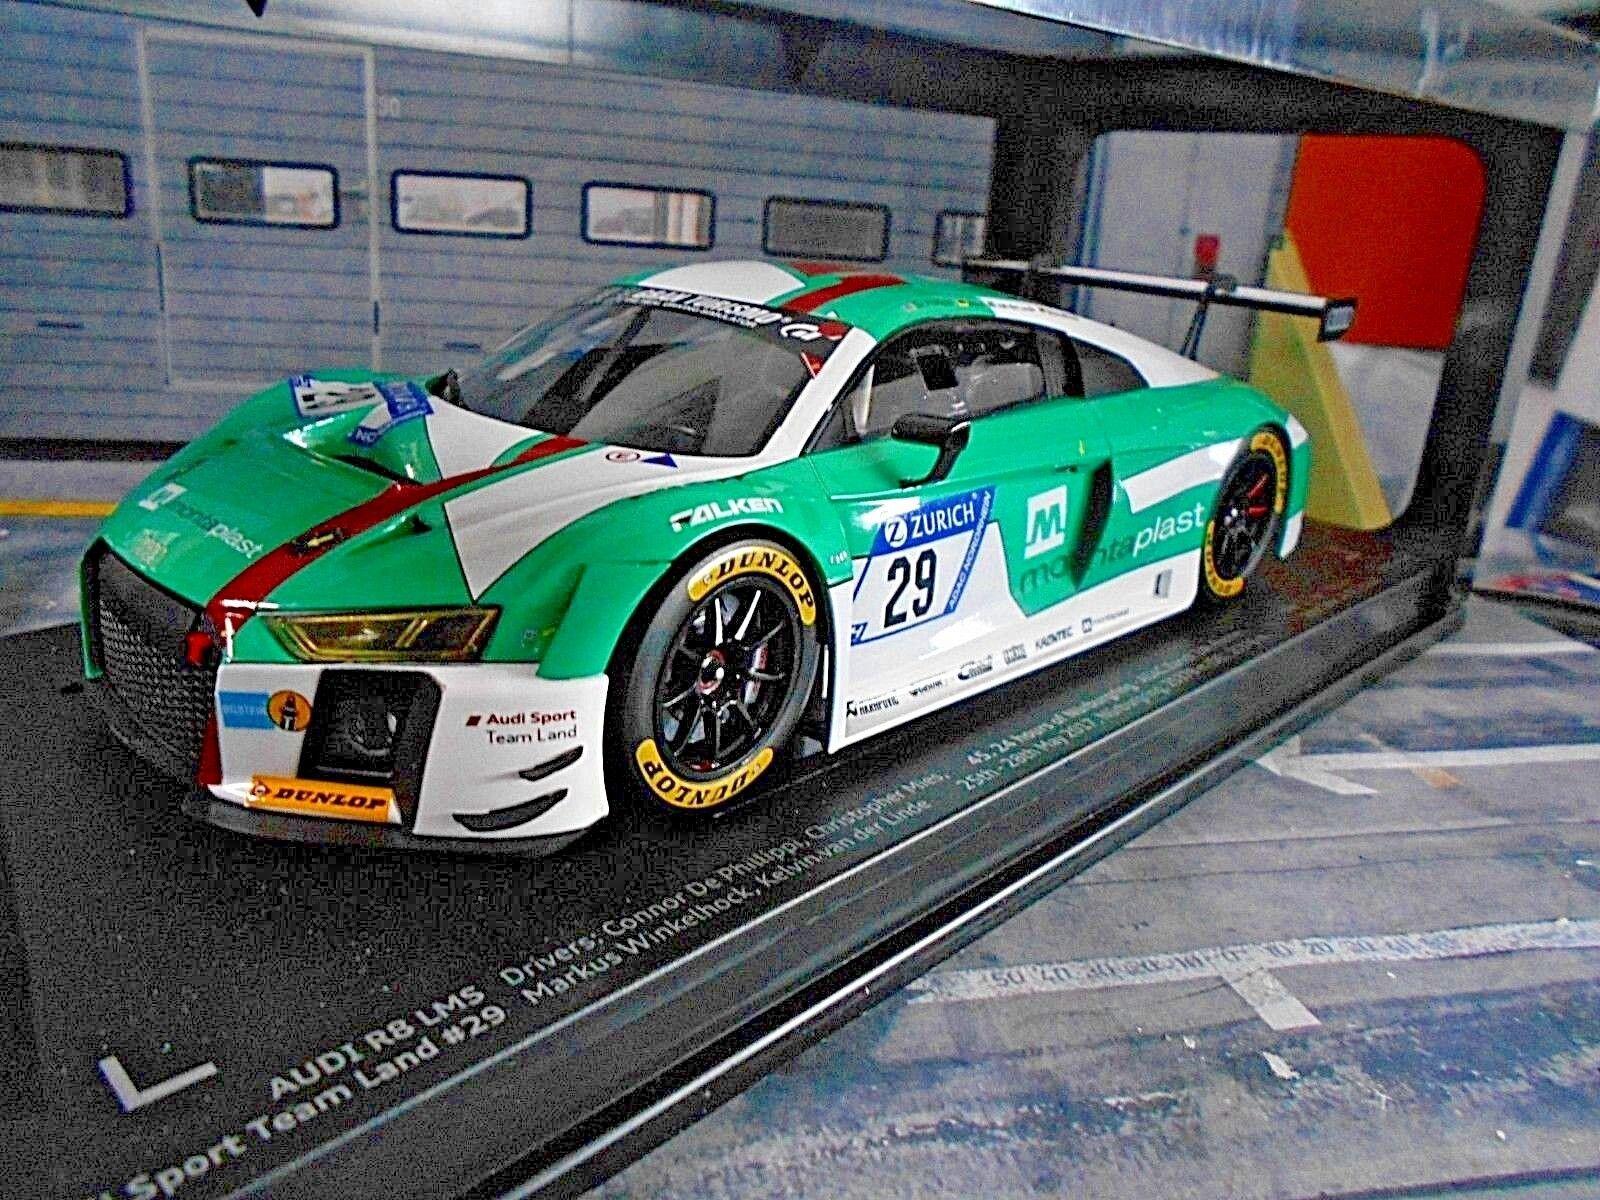 Audi r8 LMS gt3 24 nurburgring 2017 montaplast país Mies winner Paragon 1 18